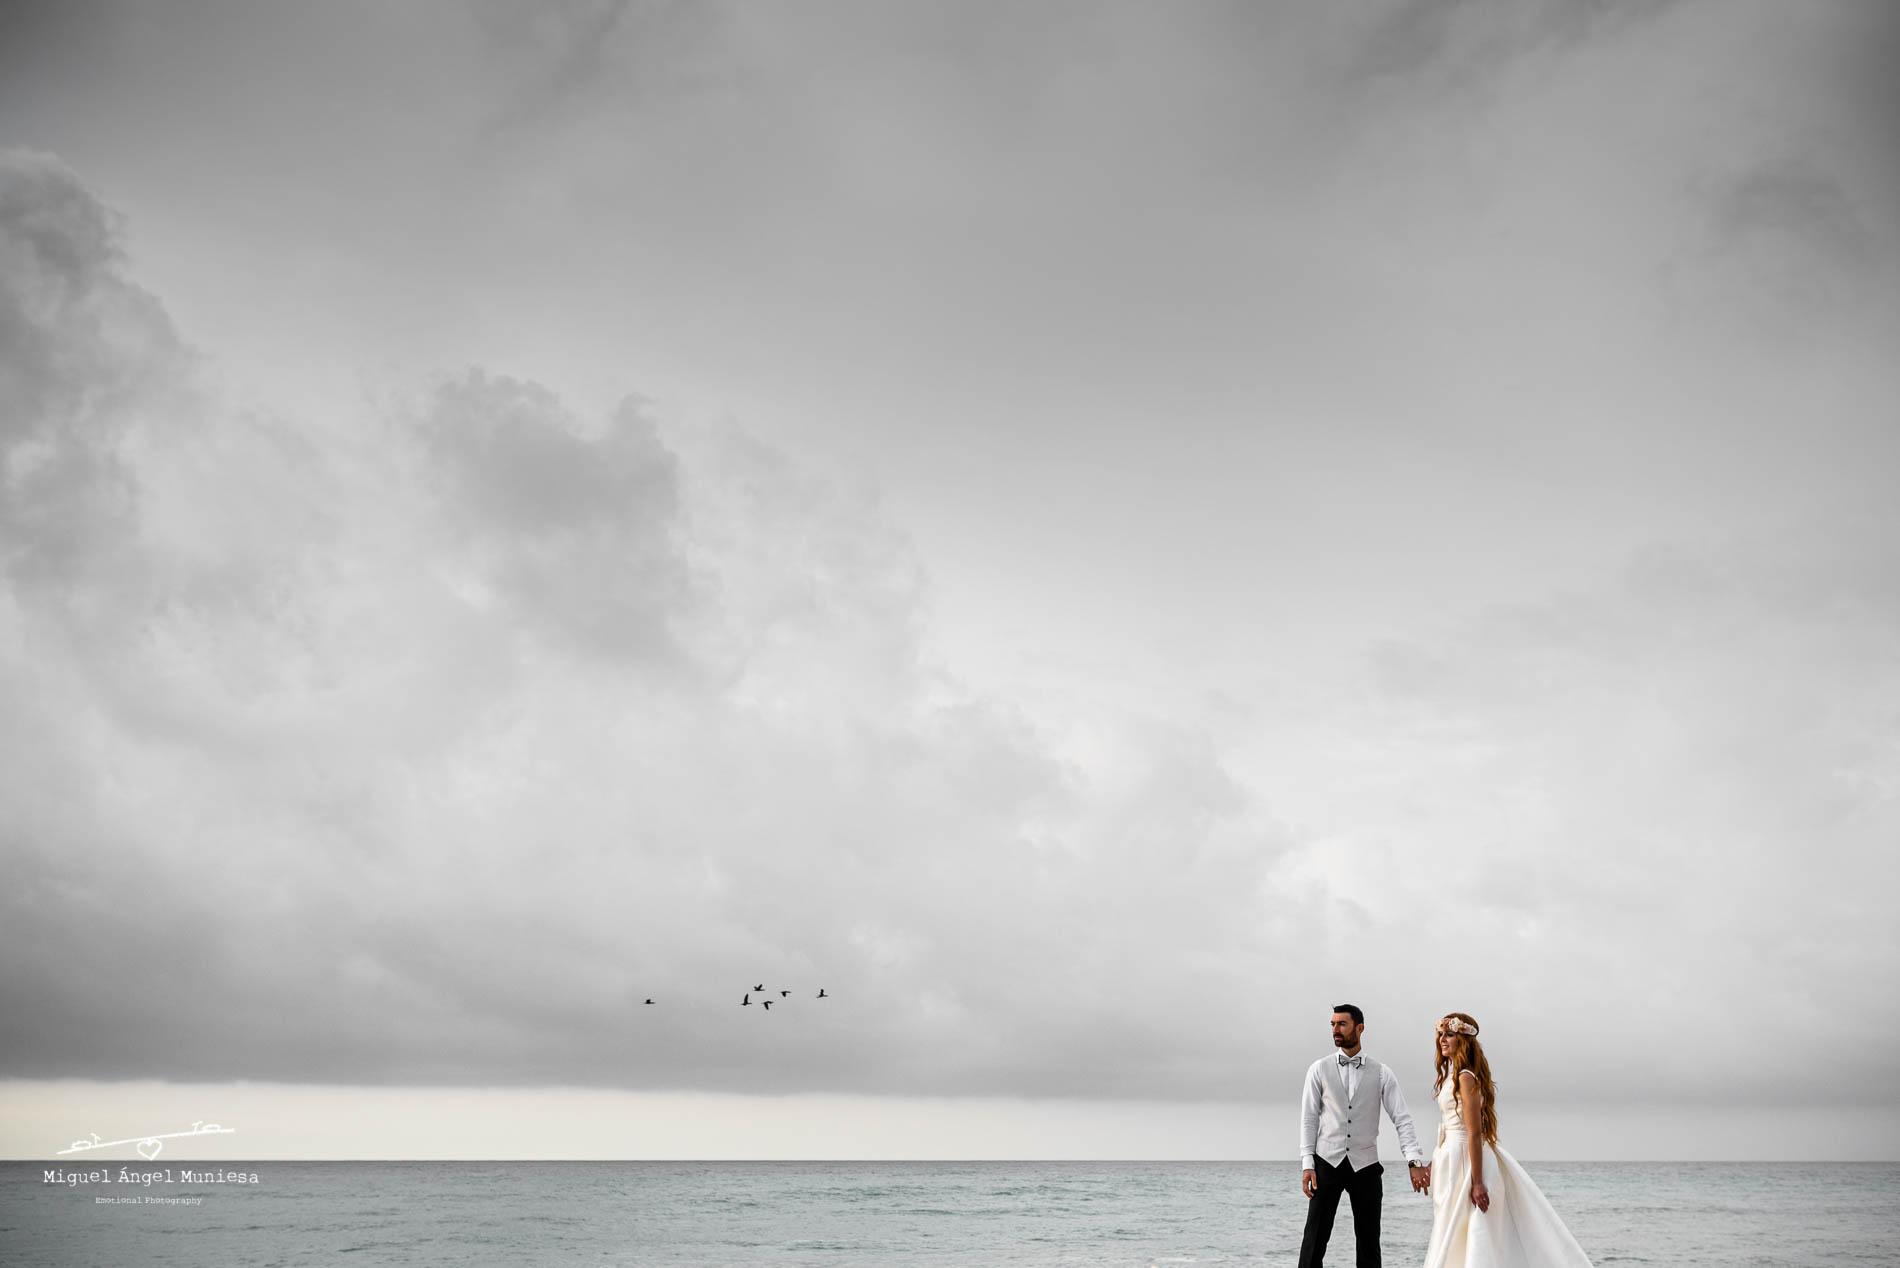 boda, fotografia de boda, boda zaragoza, fotografia, wedding, wedding photography, miguel angel muniesa, fotografo boda Zaragoza, fotografo boda, destination wedding_ 0005